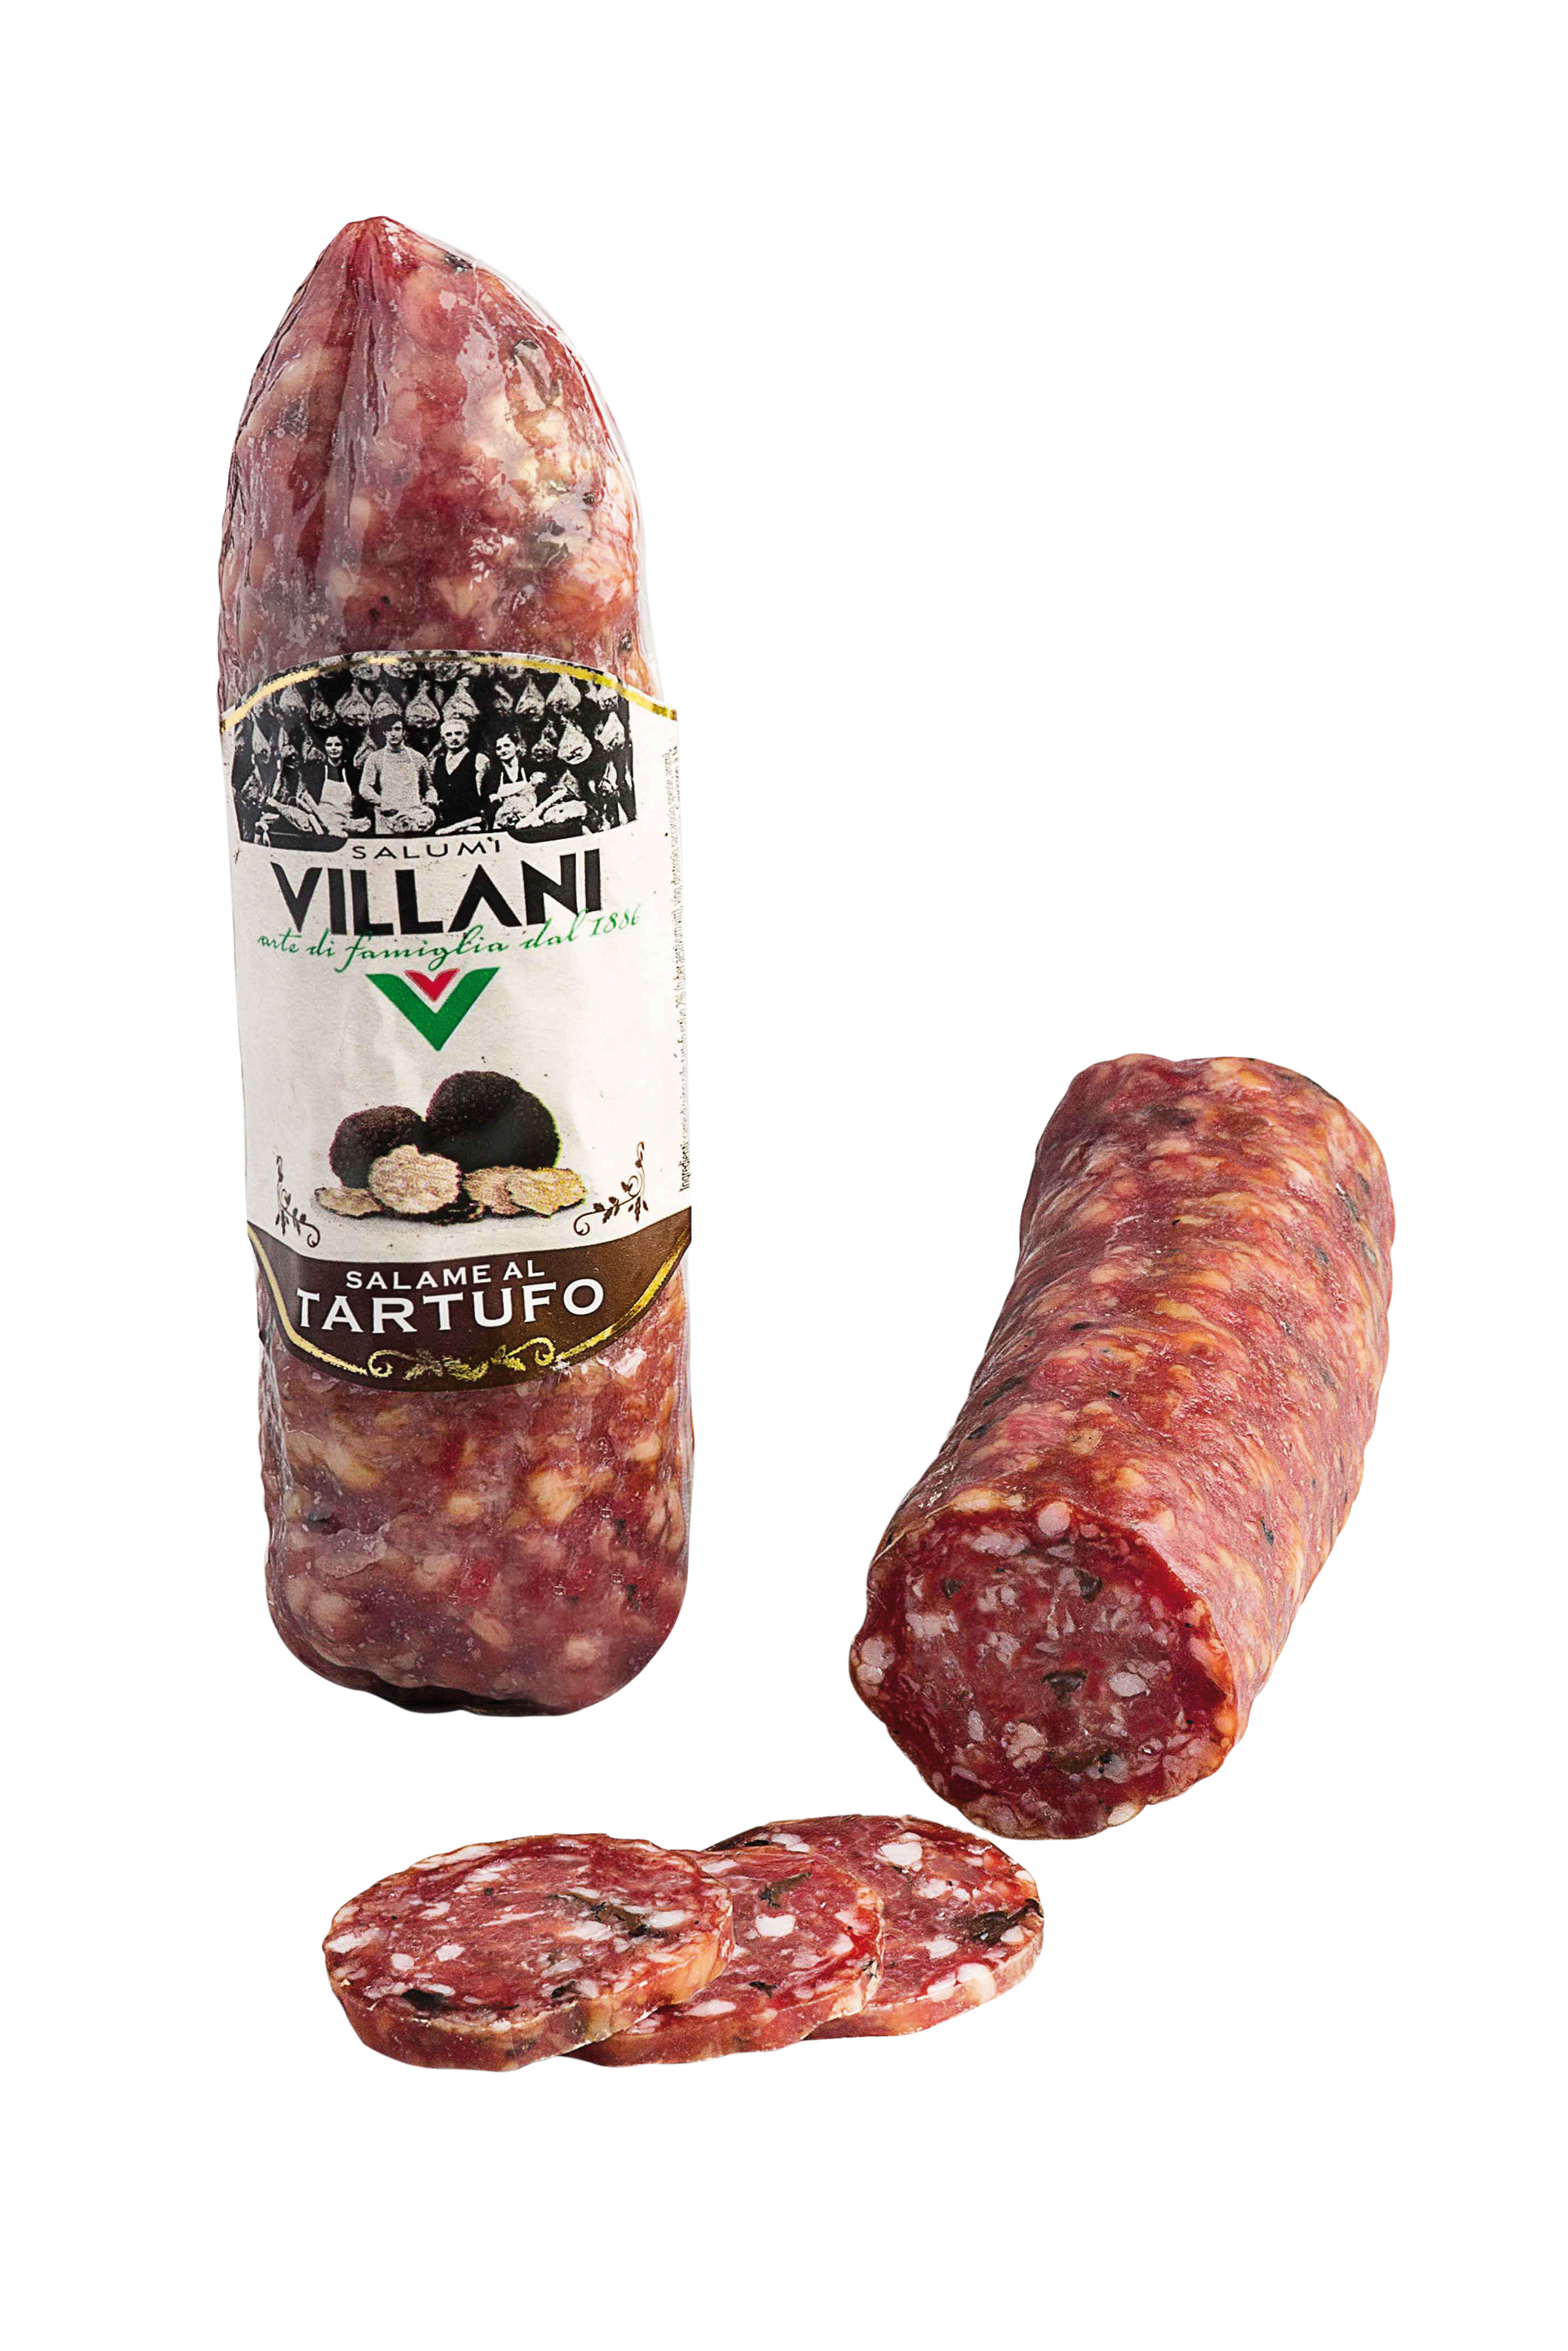 Salame al tartufo sottovuoto 220 g Villani